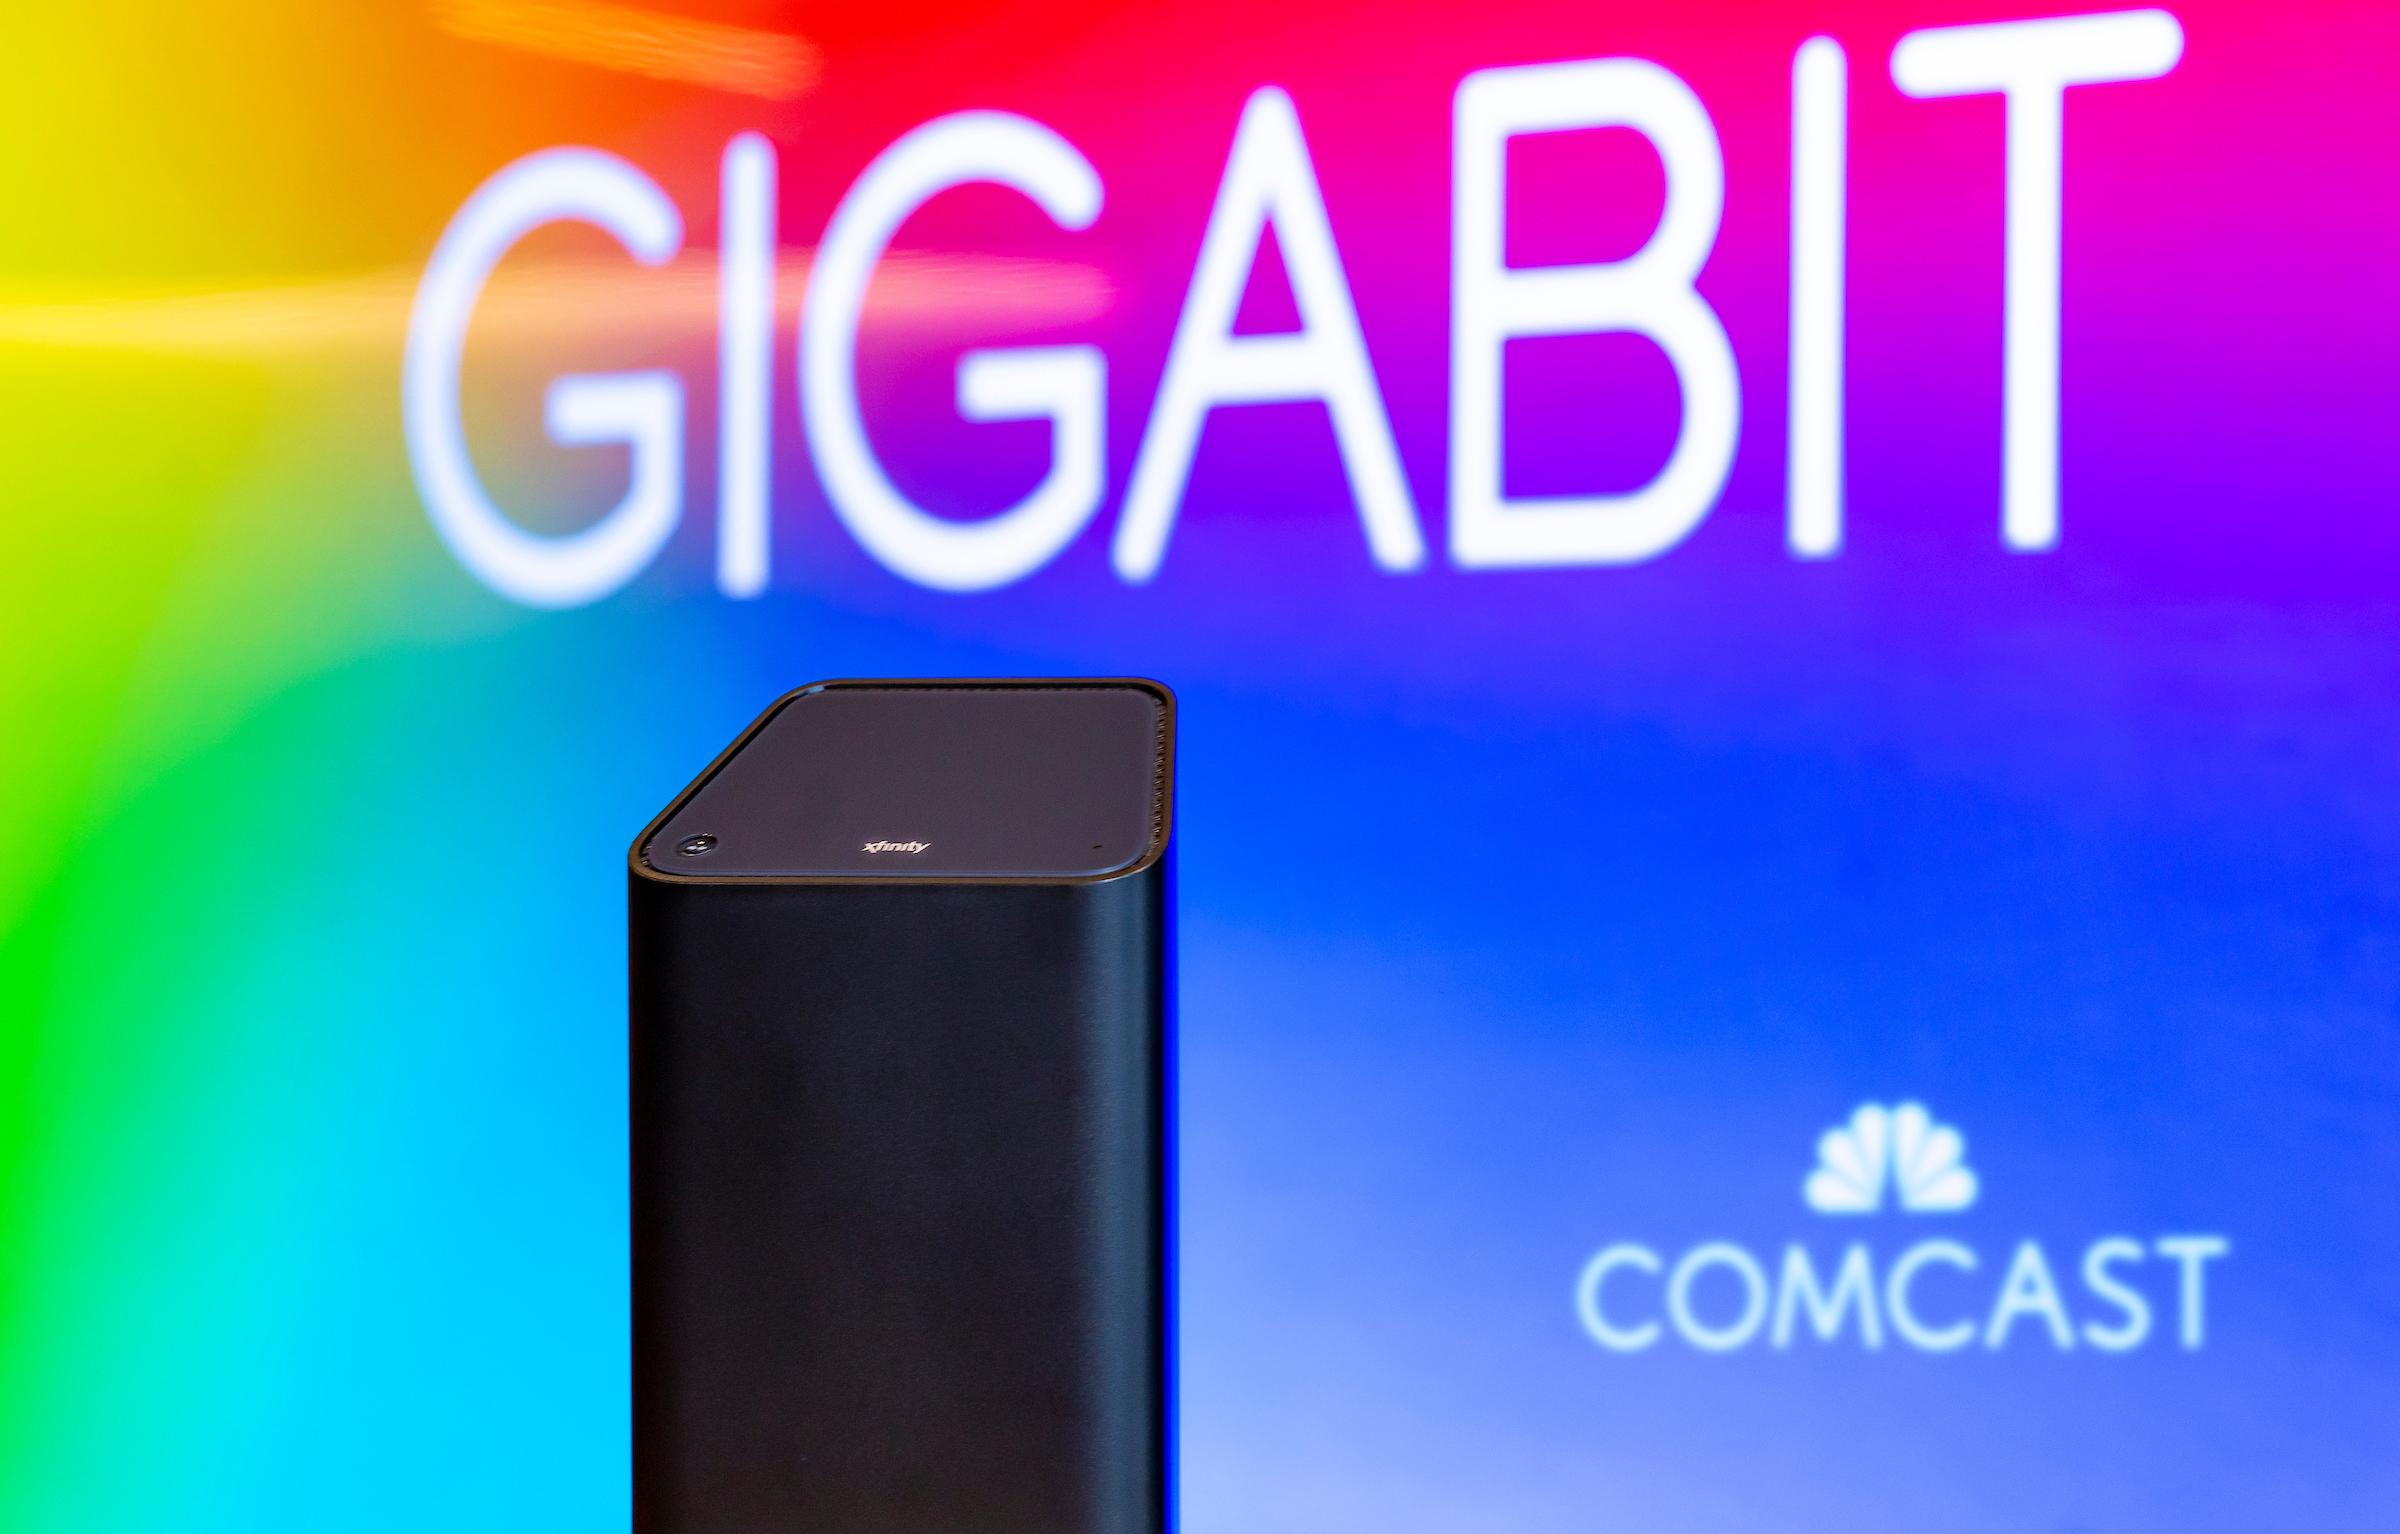 Wire Internet | Comcast Now Nation S Largest Provider Of Gigabit Internet Business